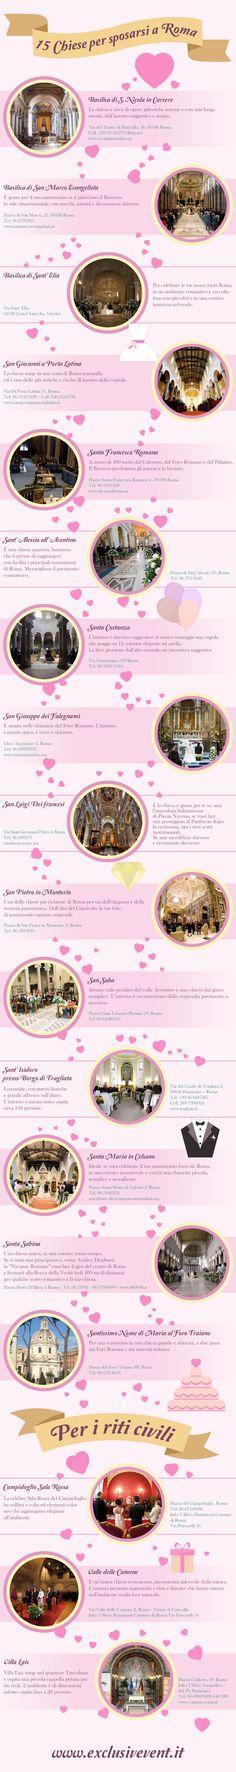 Chiese per matrimonio a Roma.   #wedding #Rome #matrimonio #location #Roma #chiese #church